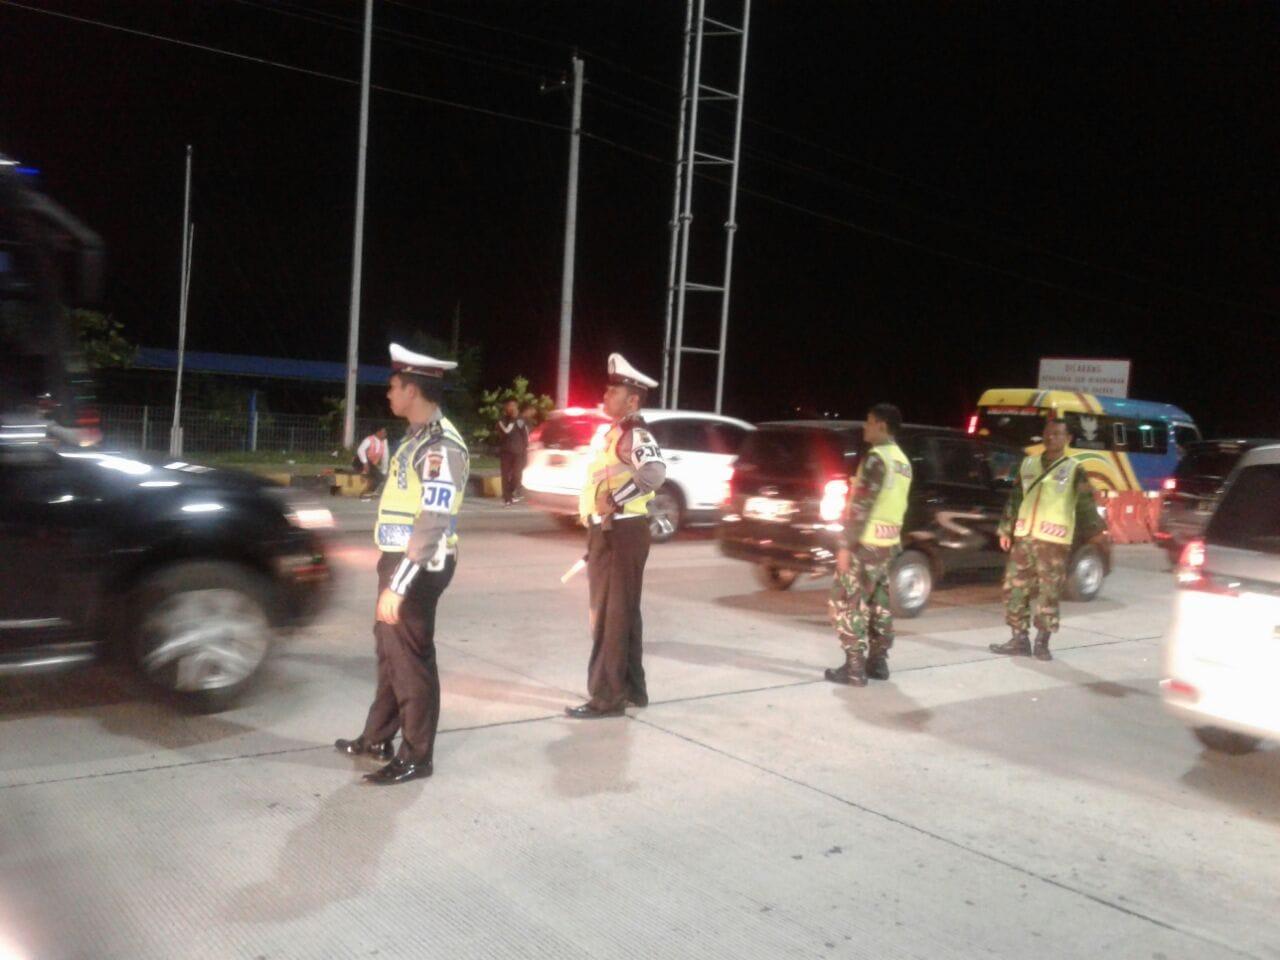 Utamakan Kenyaman dan Keamanan Pemudik, TNI-Polri Siaga di Beberapa Titik Rawan Kemacetan